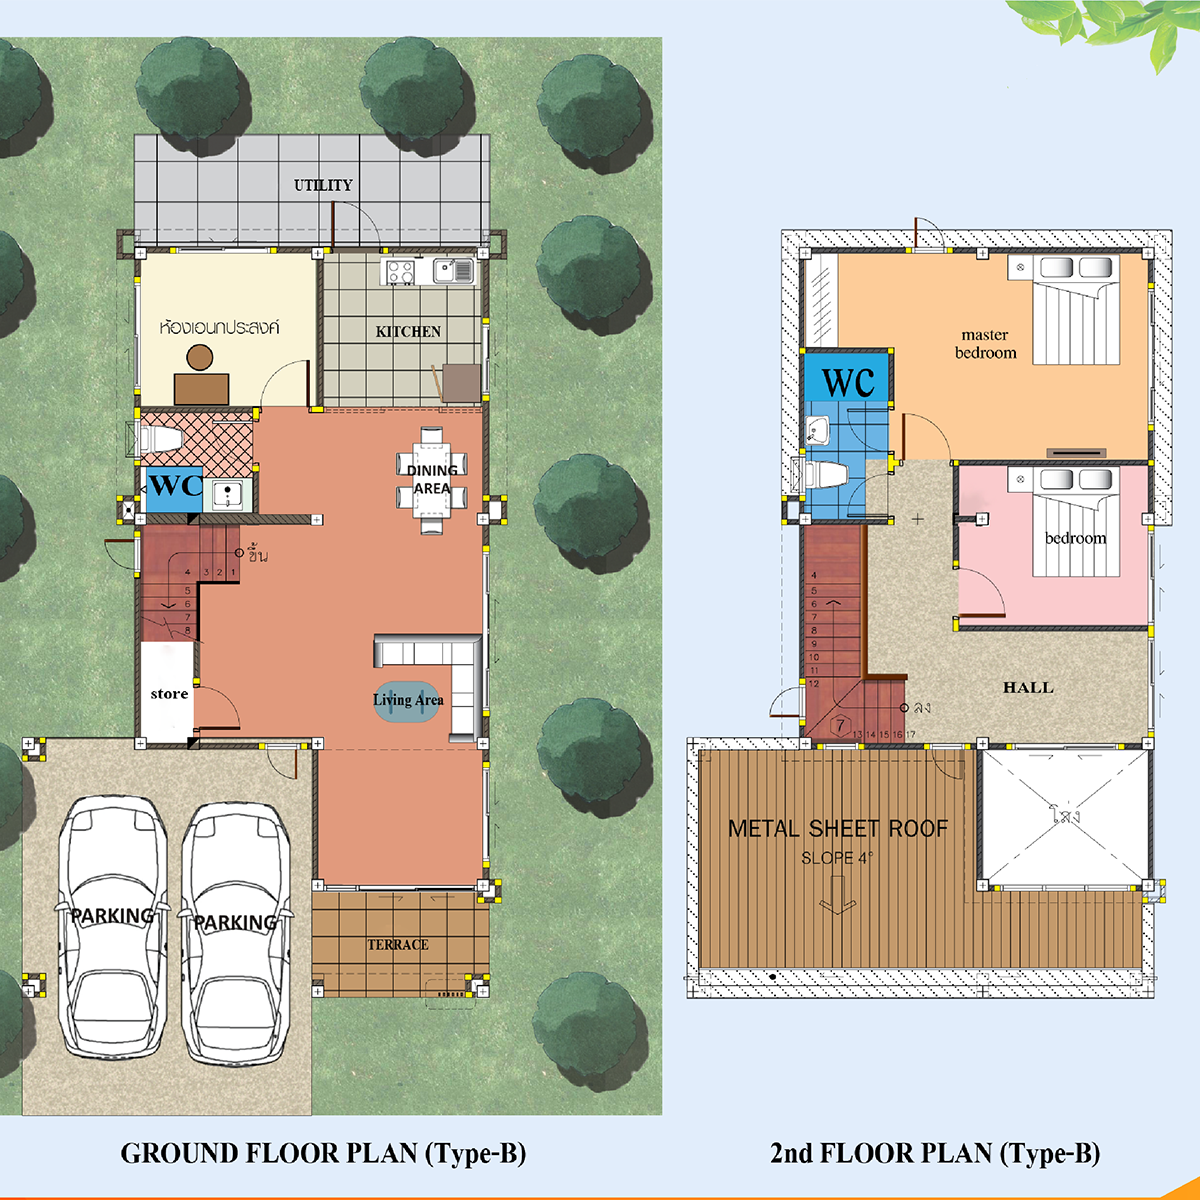 Ground Floor Plan (Type -B )